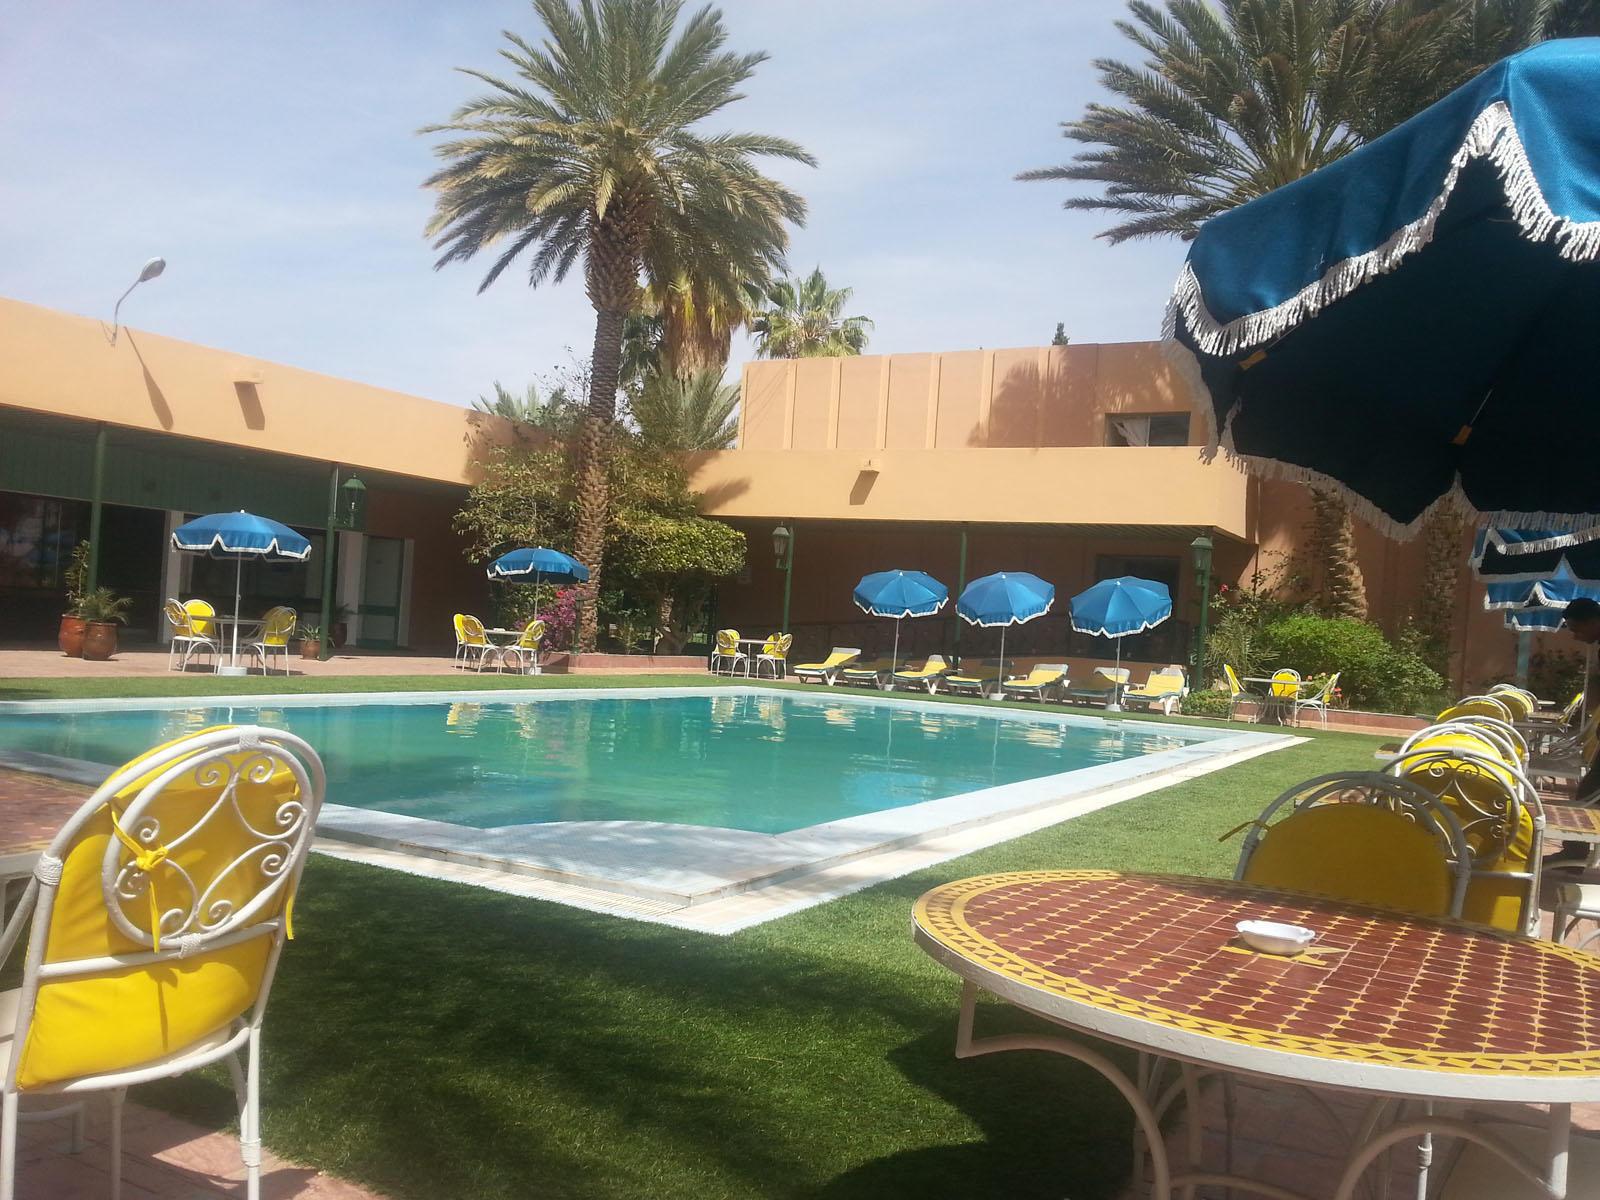 Pool at Kenzi Rissani Hotel in Errachidia, Morocco